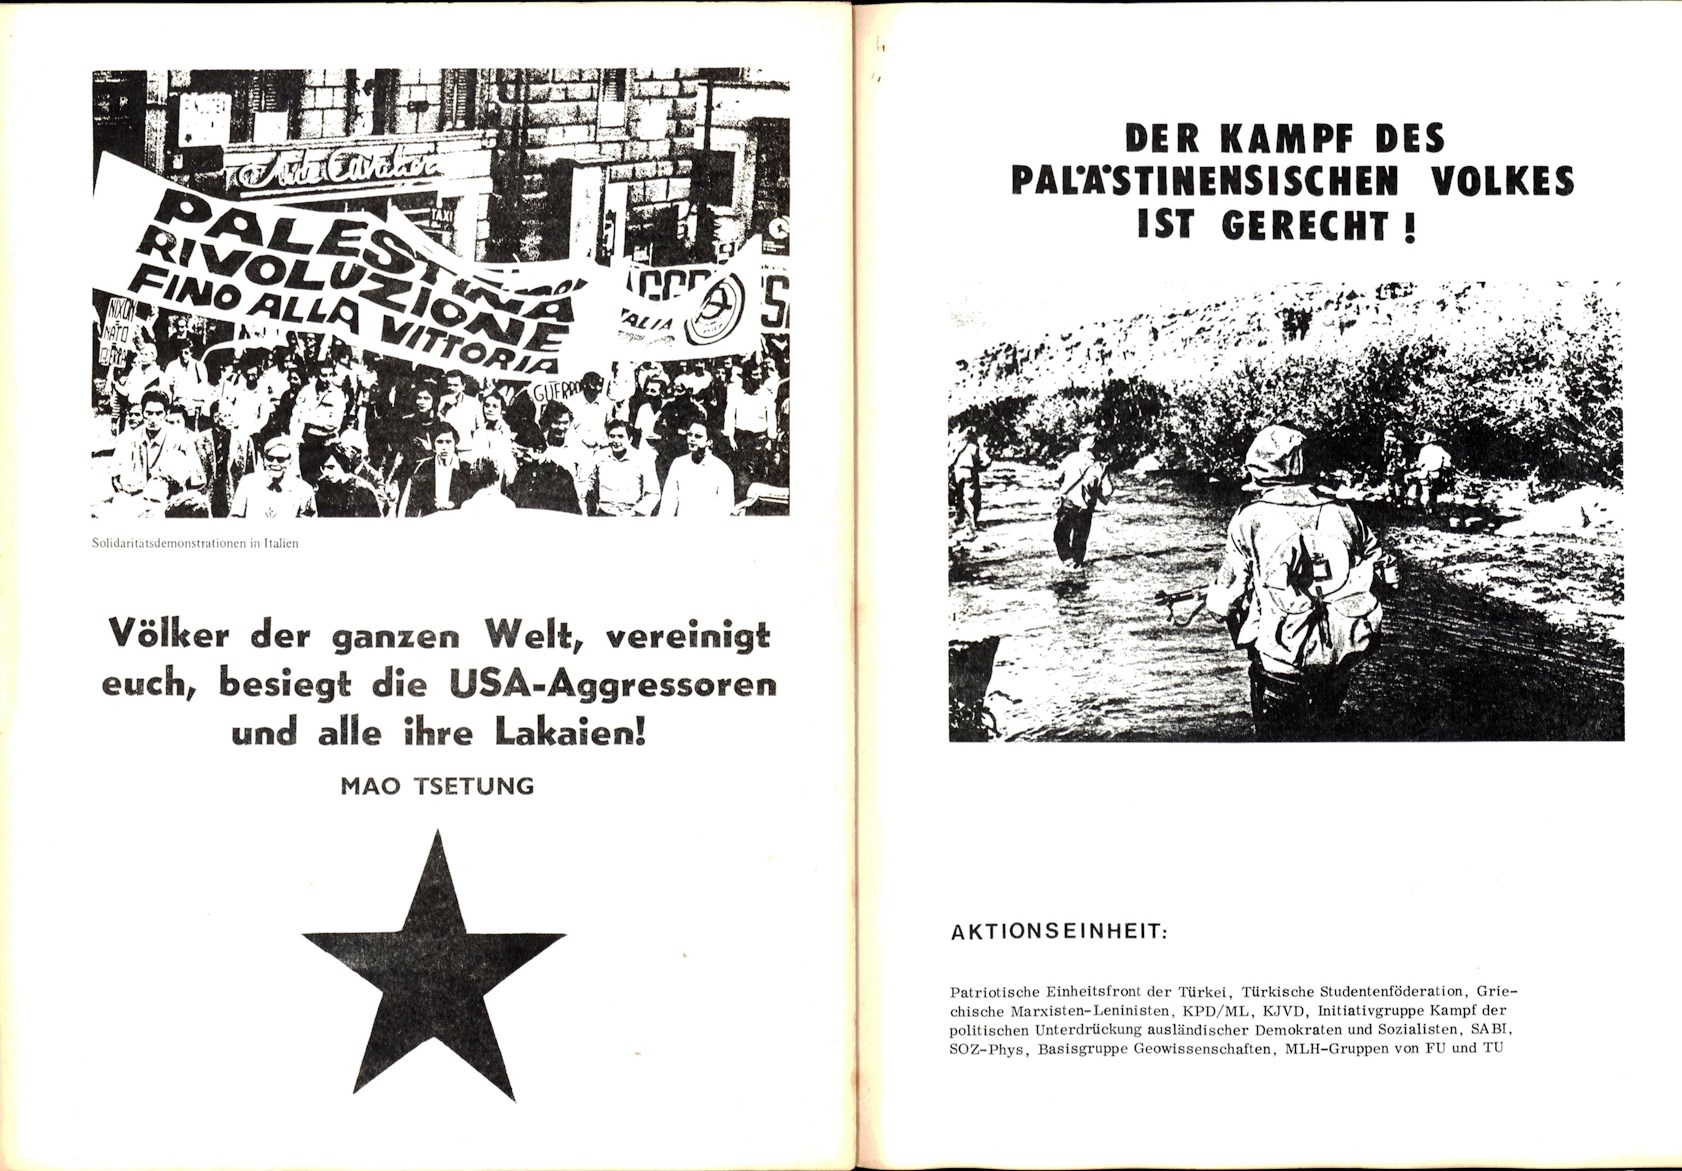 Berlin_AE_1972_Palaestina_01